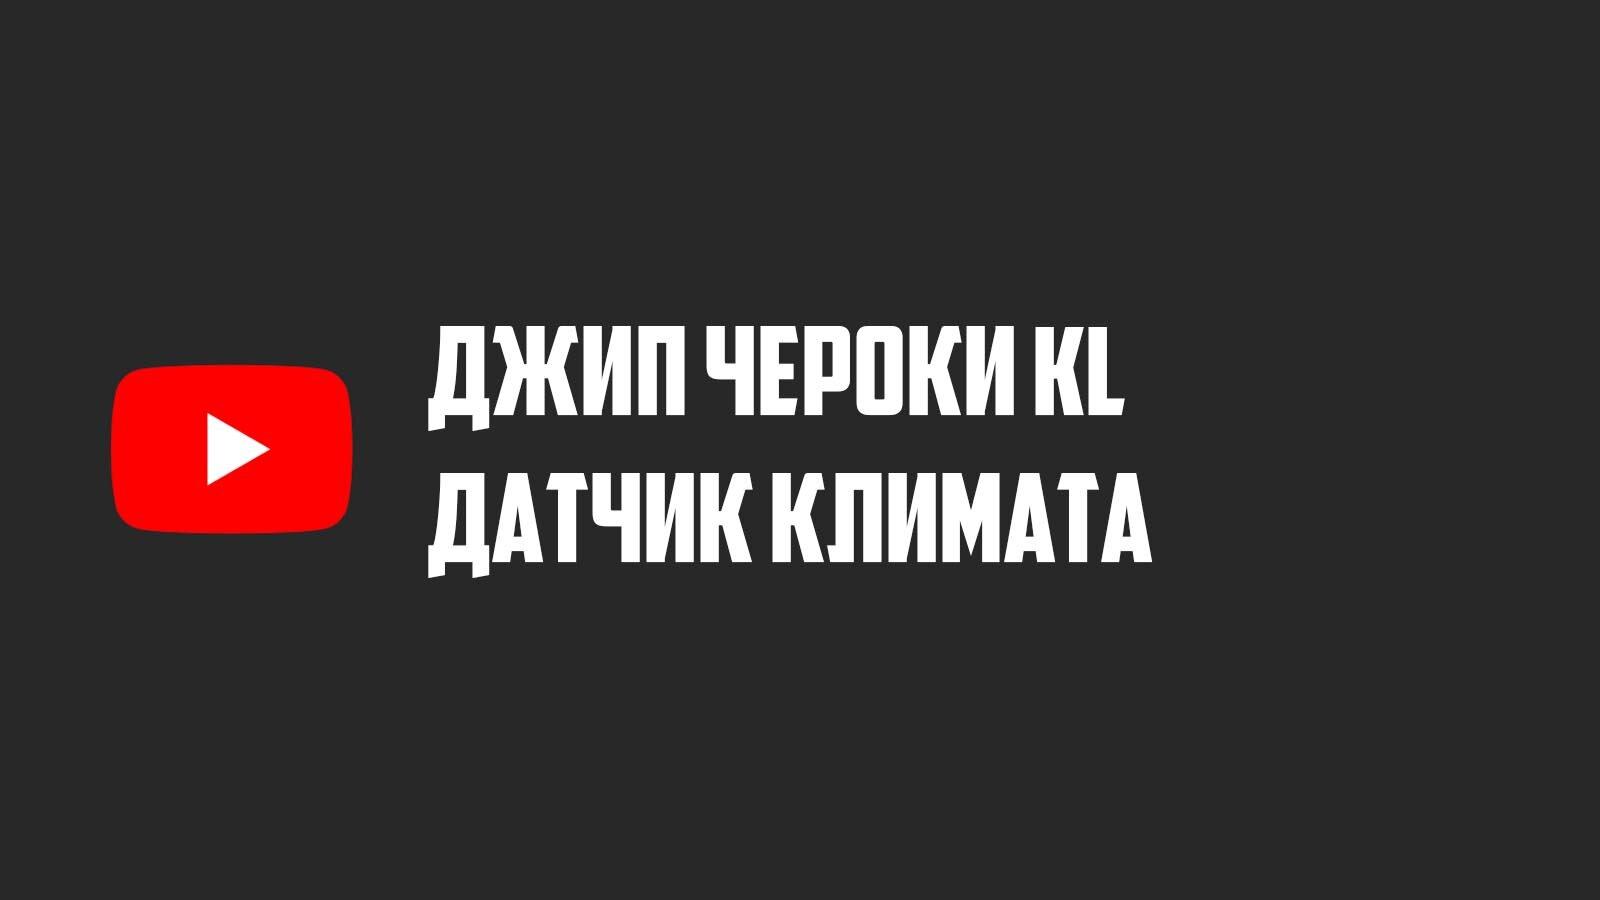 Датчик климата Джип Чероки KL